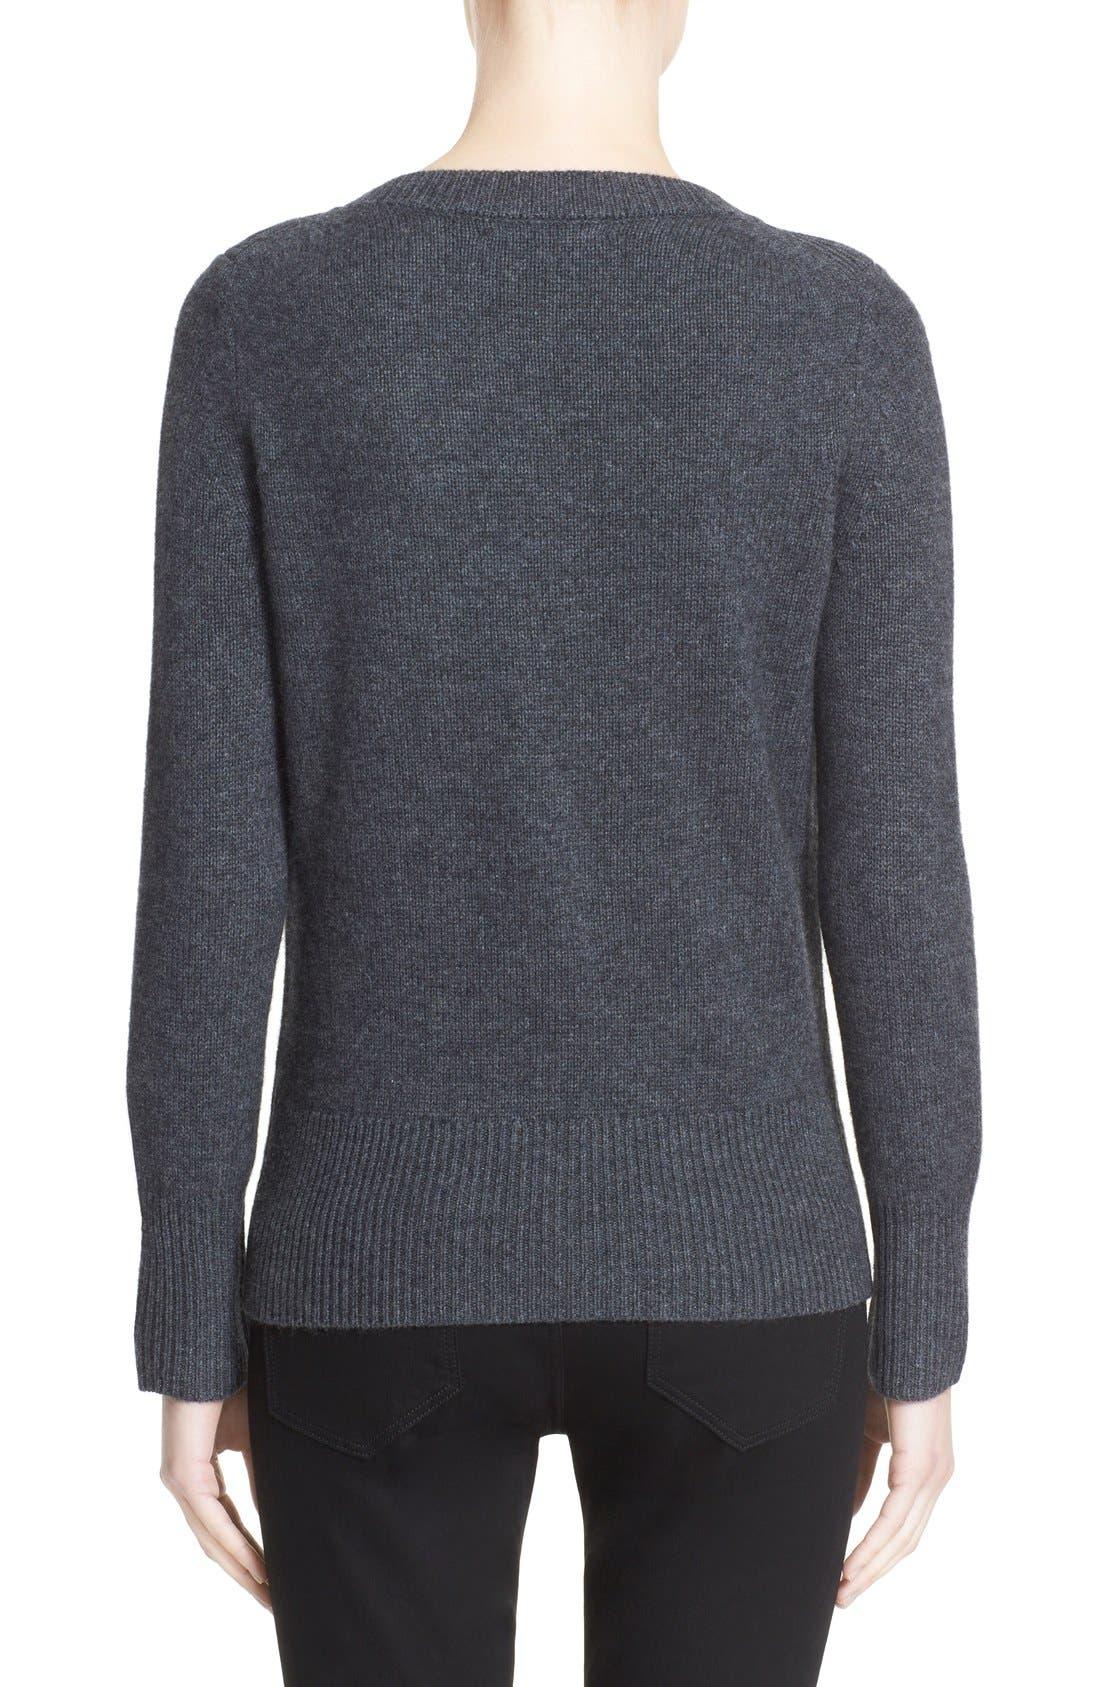 BURBERRY LONDON,                             Embellished Crewneck Sweater,                             Alternate thumbnail 3, color,                             026